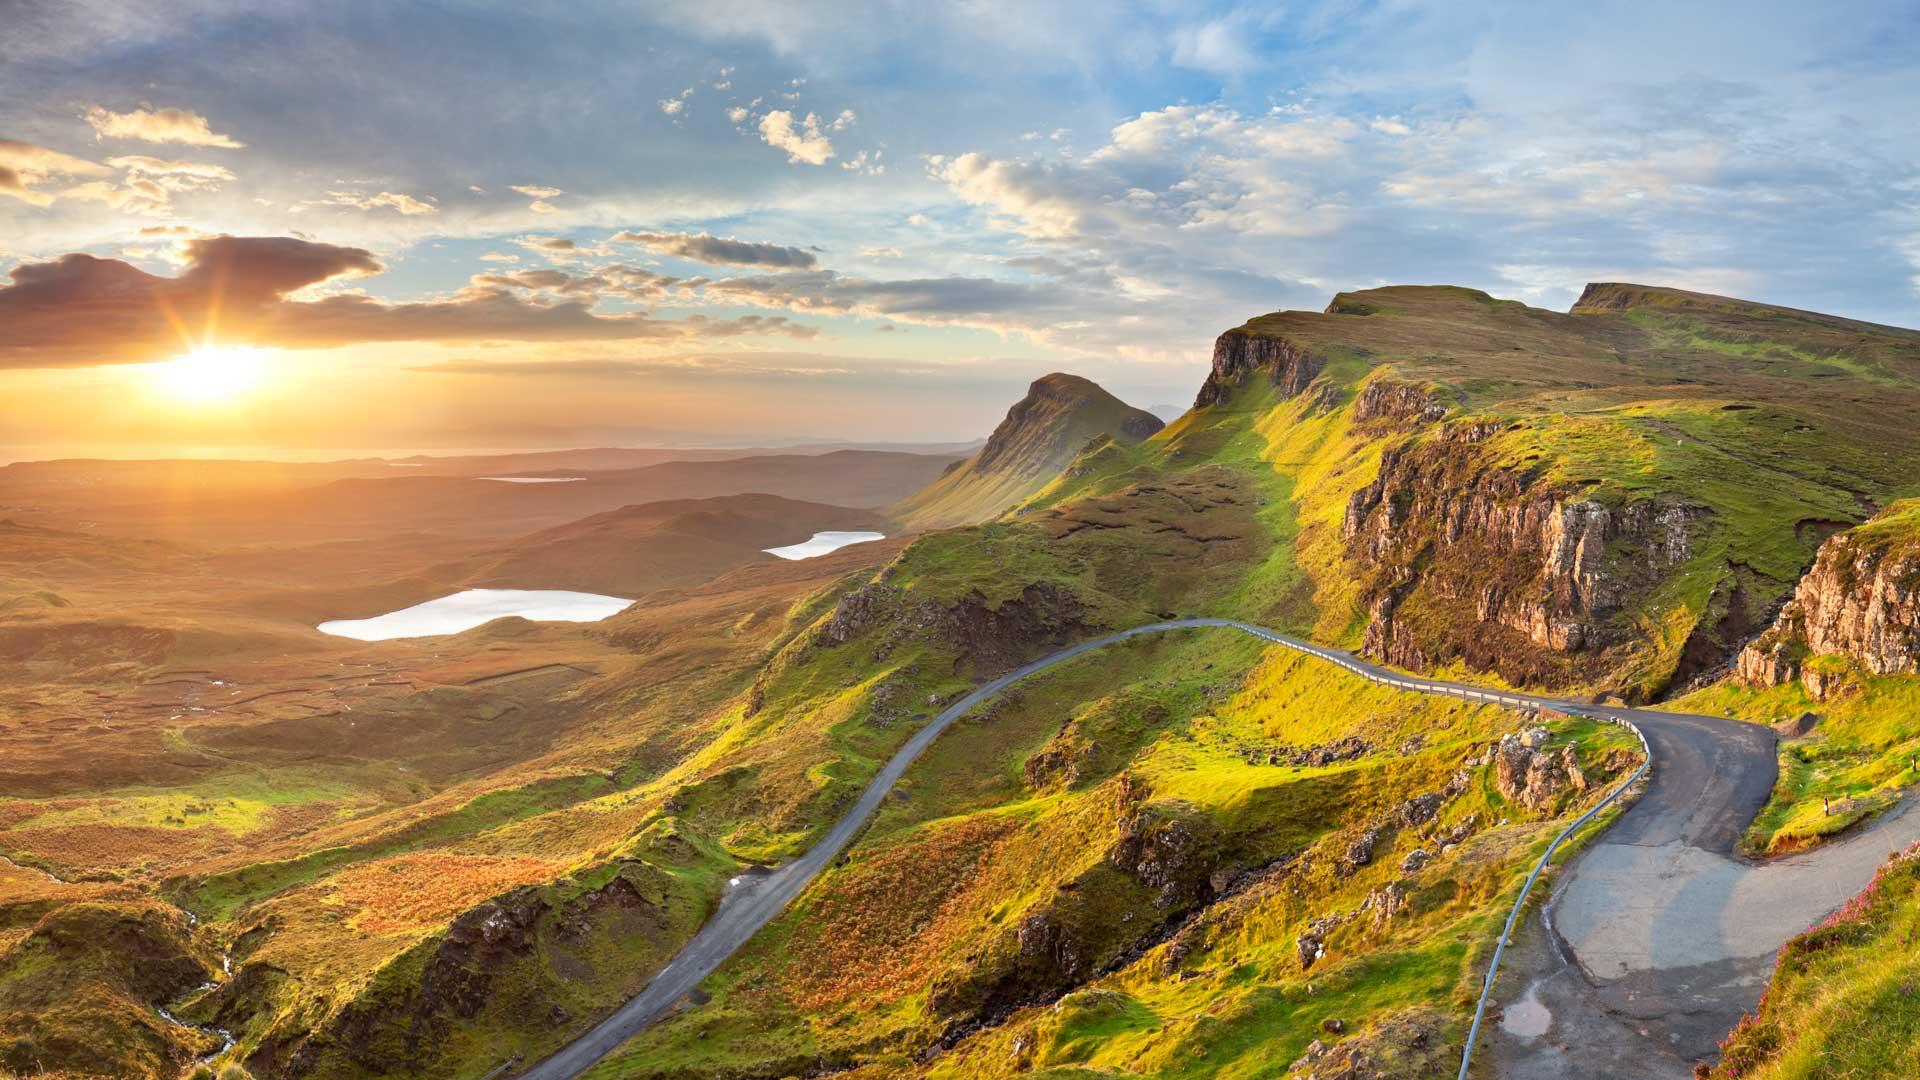 highland mountains